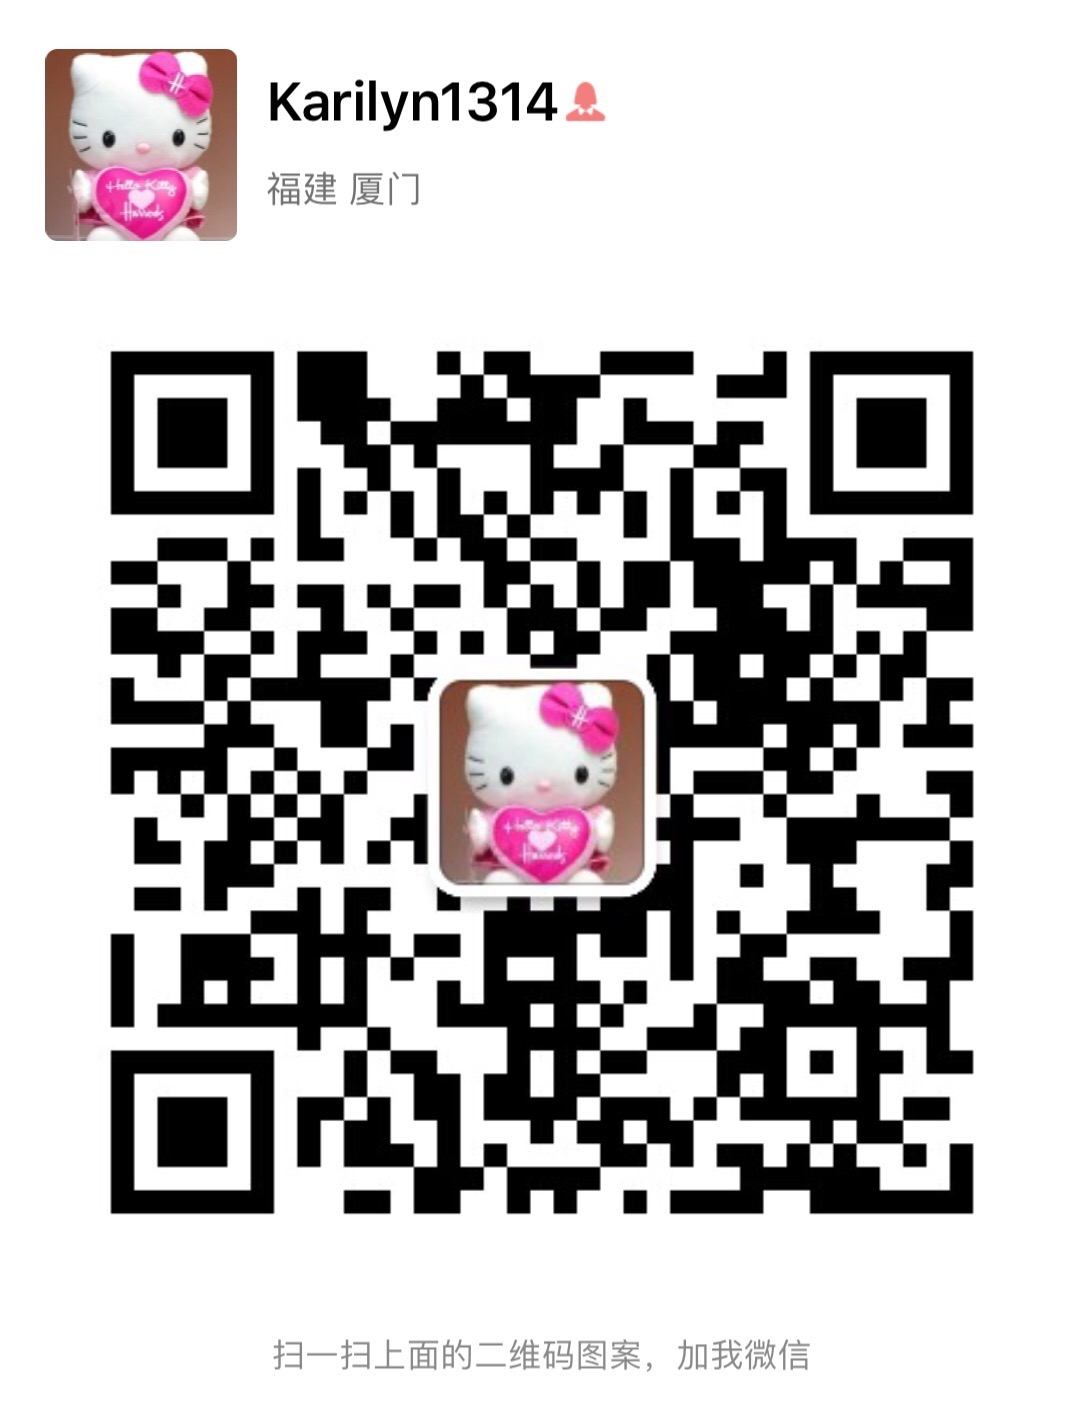 9215C7F5-4645-4DE5-8B1A-A849FF87FFF4.jpeg